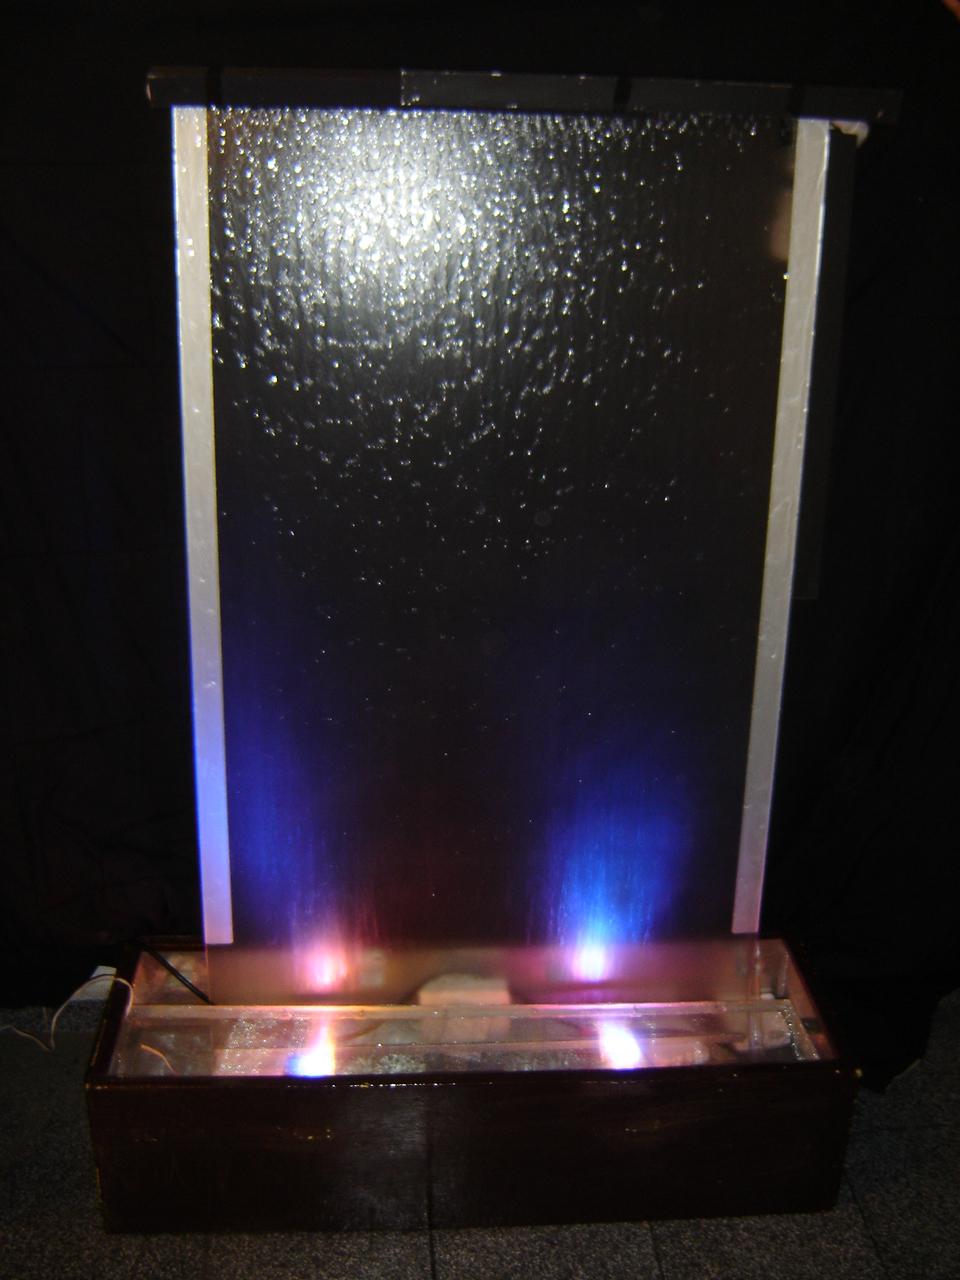 Fuentes modernas cortina de agua sobre cristal - Fuentes de pared modernas ...